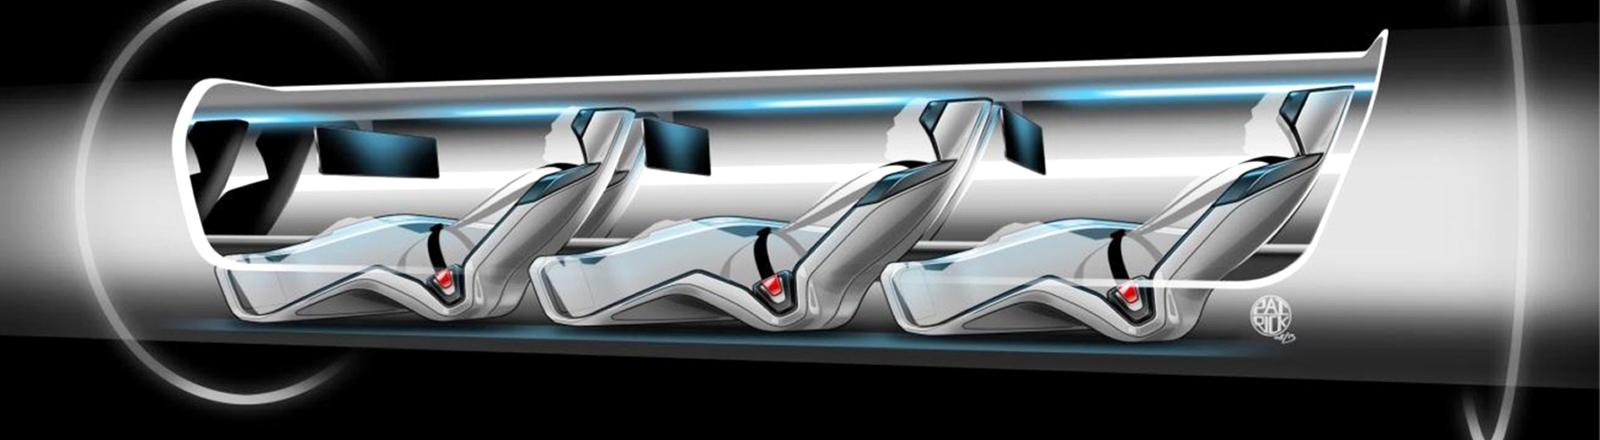 Animation einer Hyperloop-Kapsel